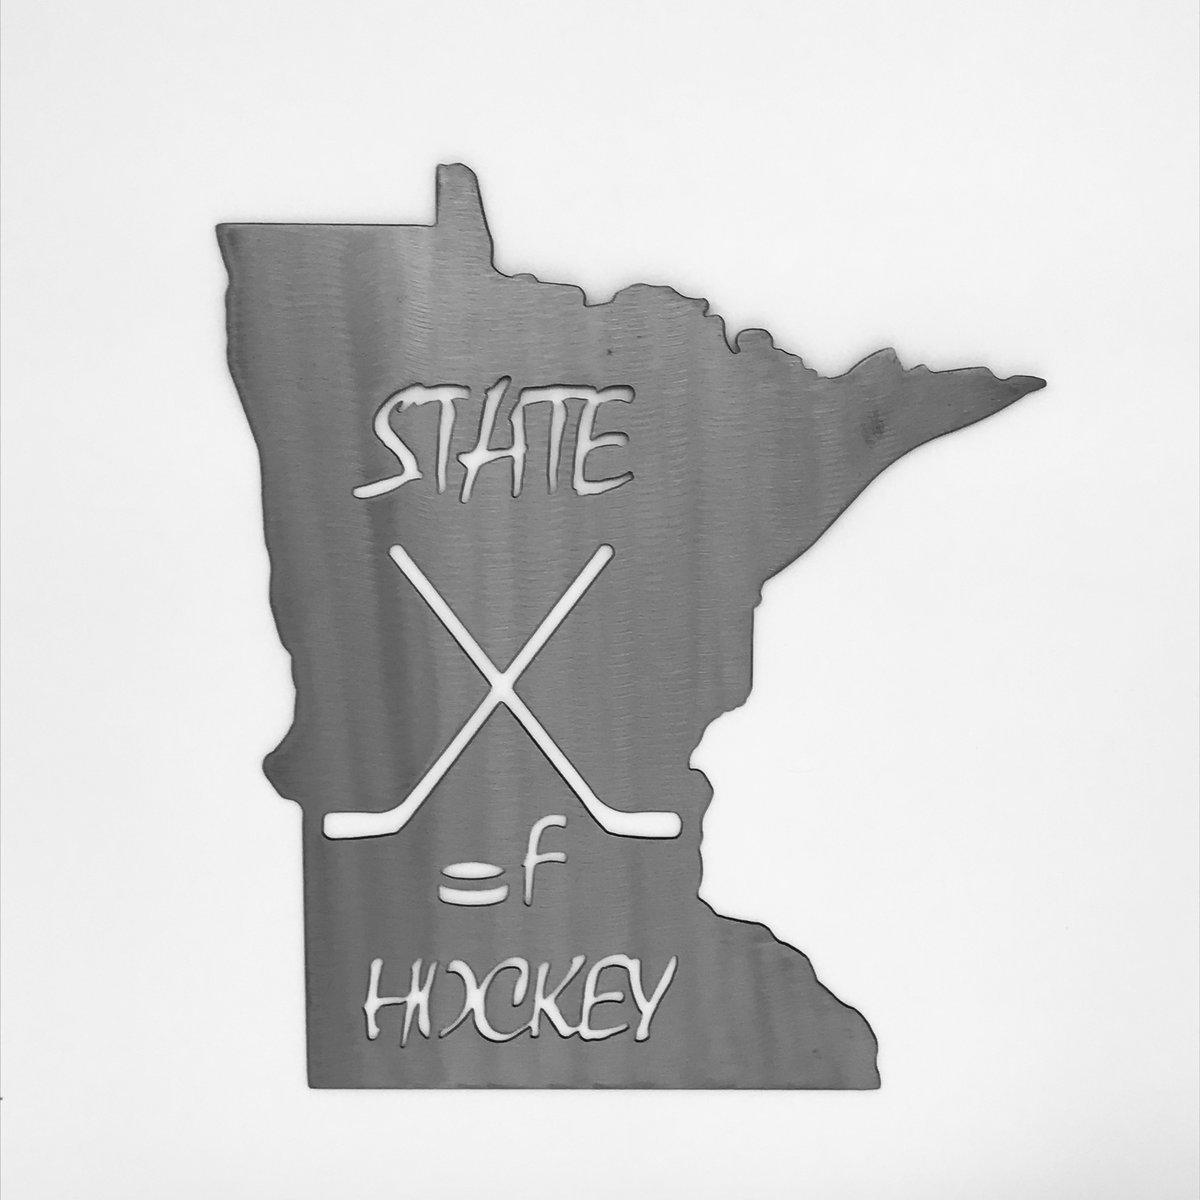 State of Hockey Minnesota